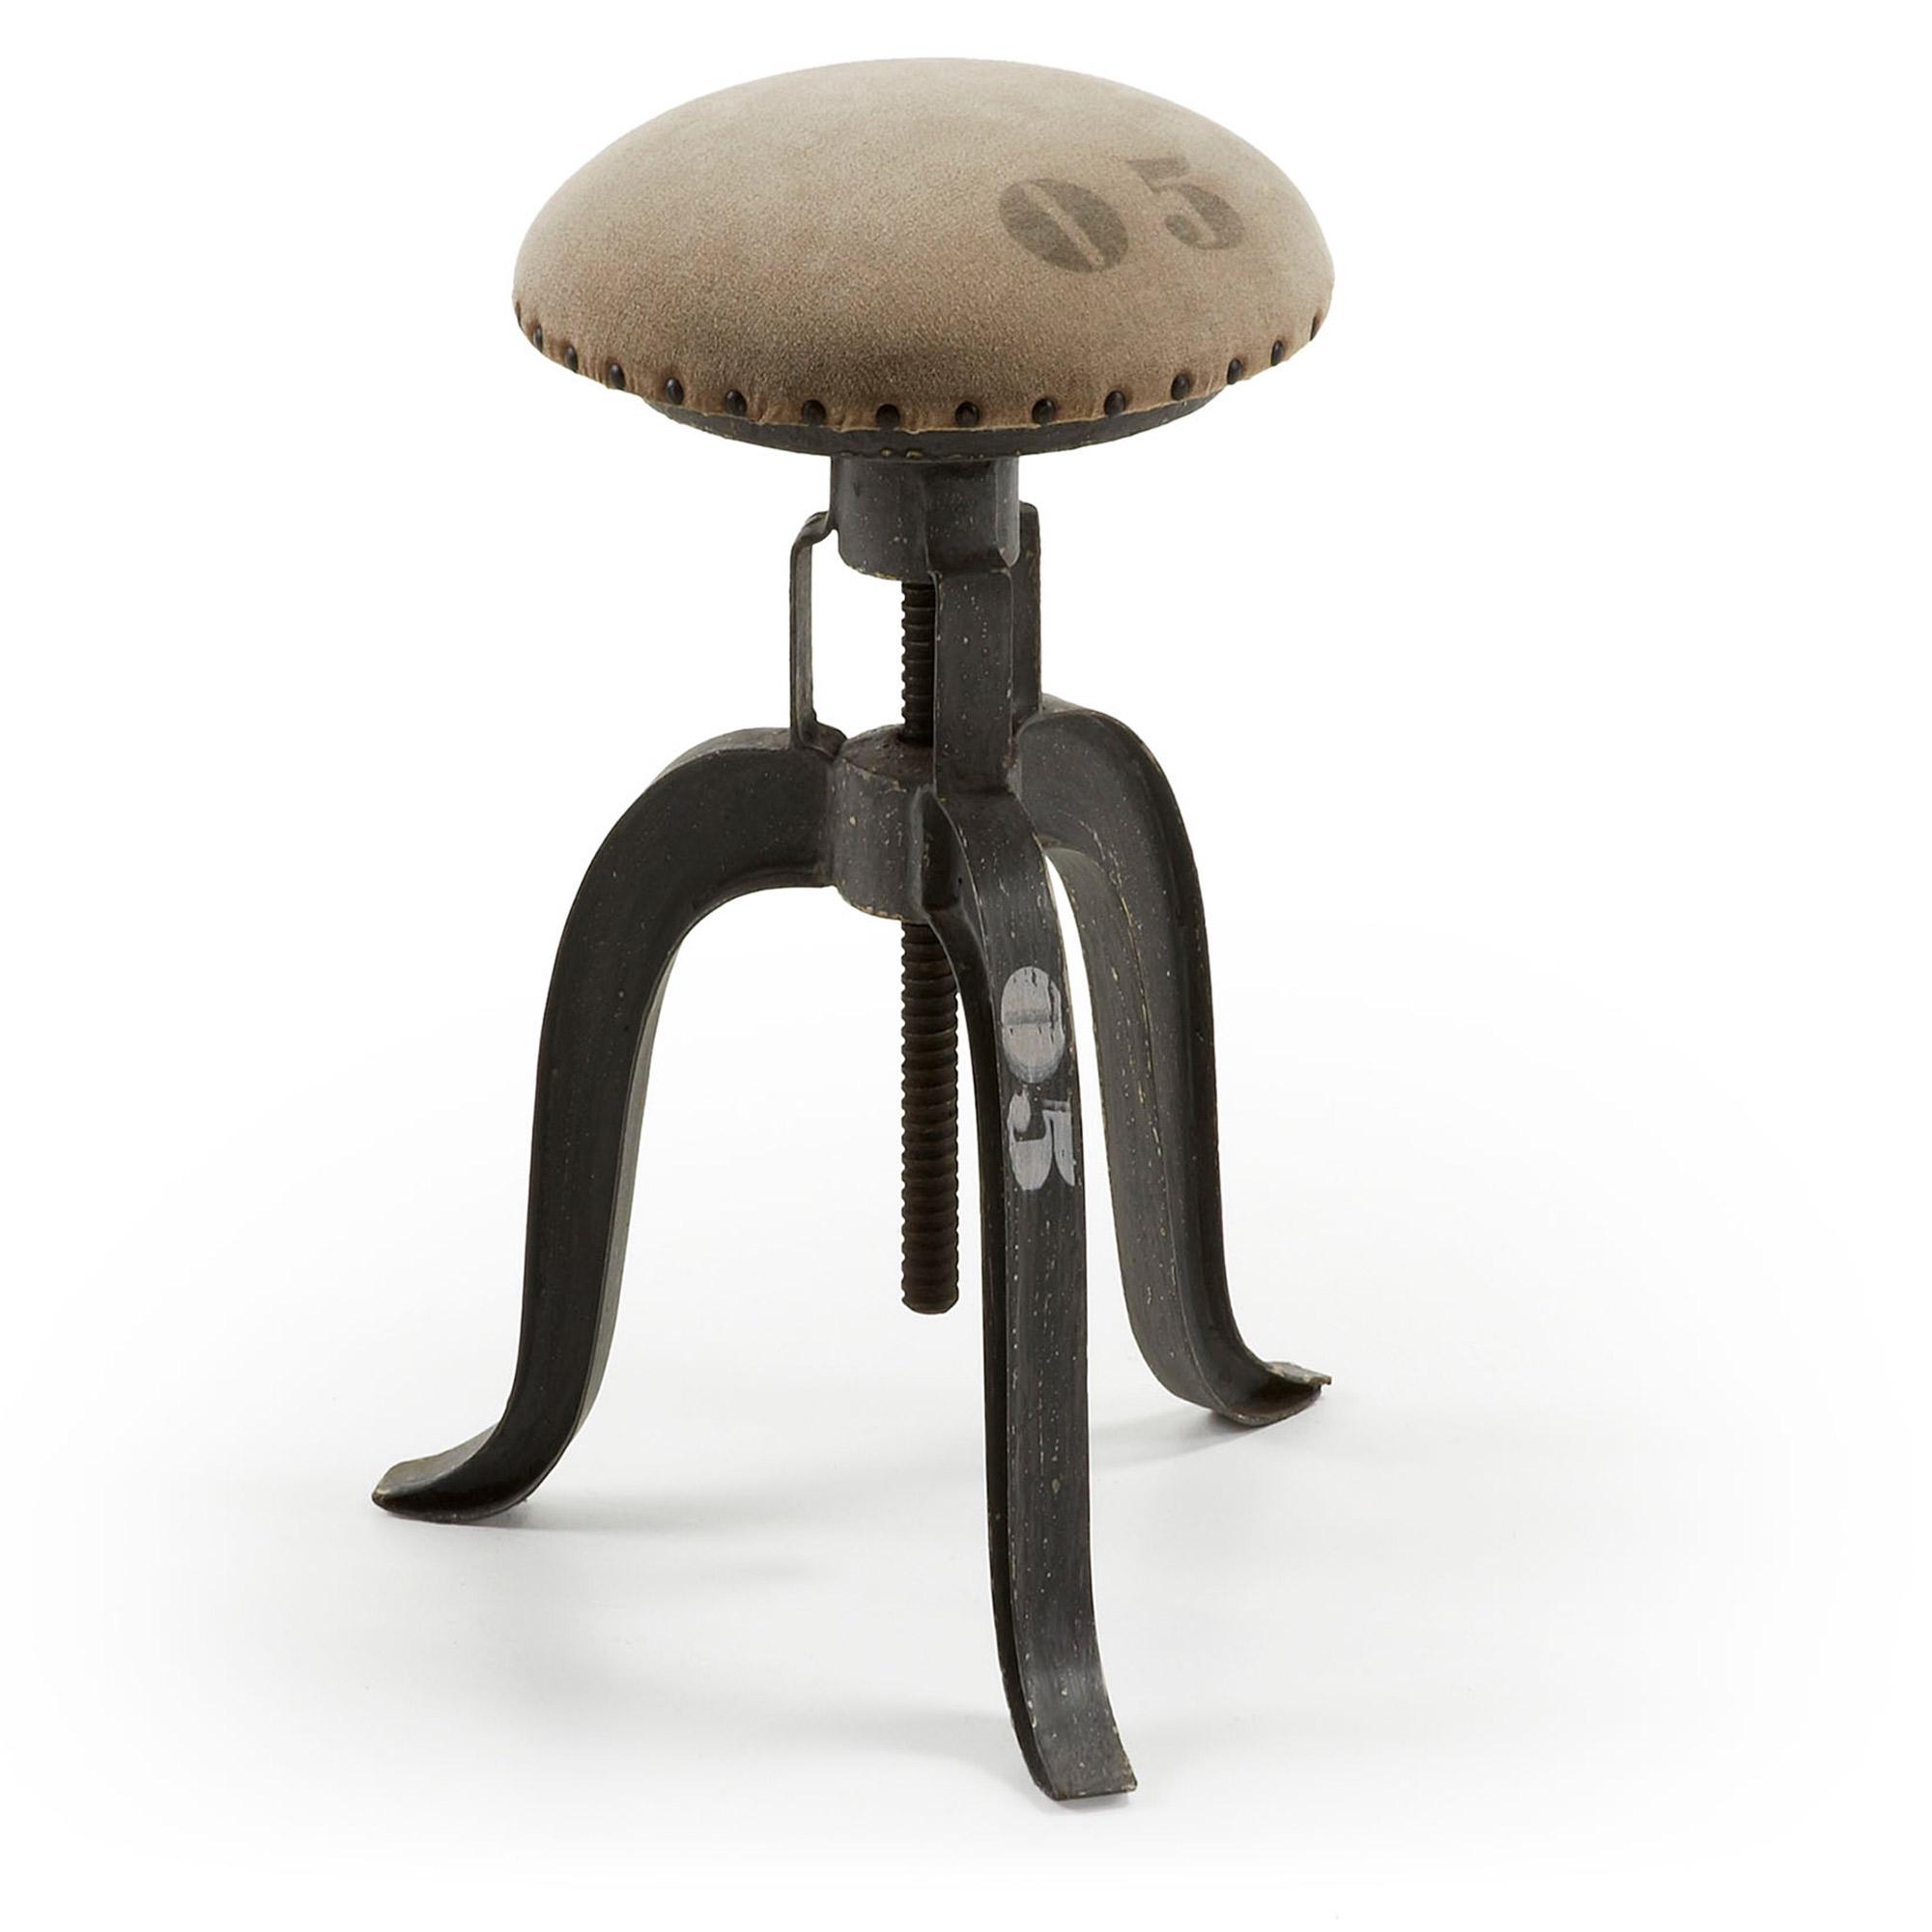 Laforma einner barstol - beige/mørkegrå canvas/metal fra laforma på boboonline.dk